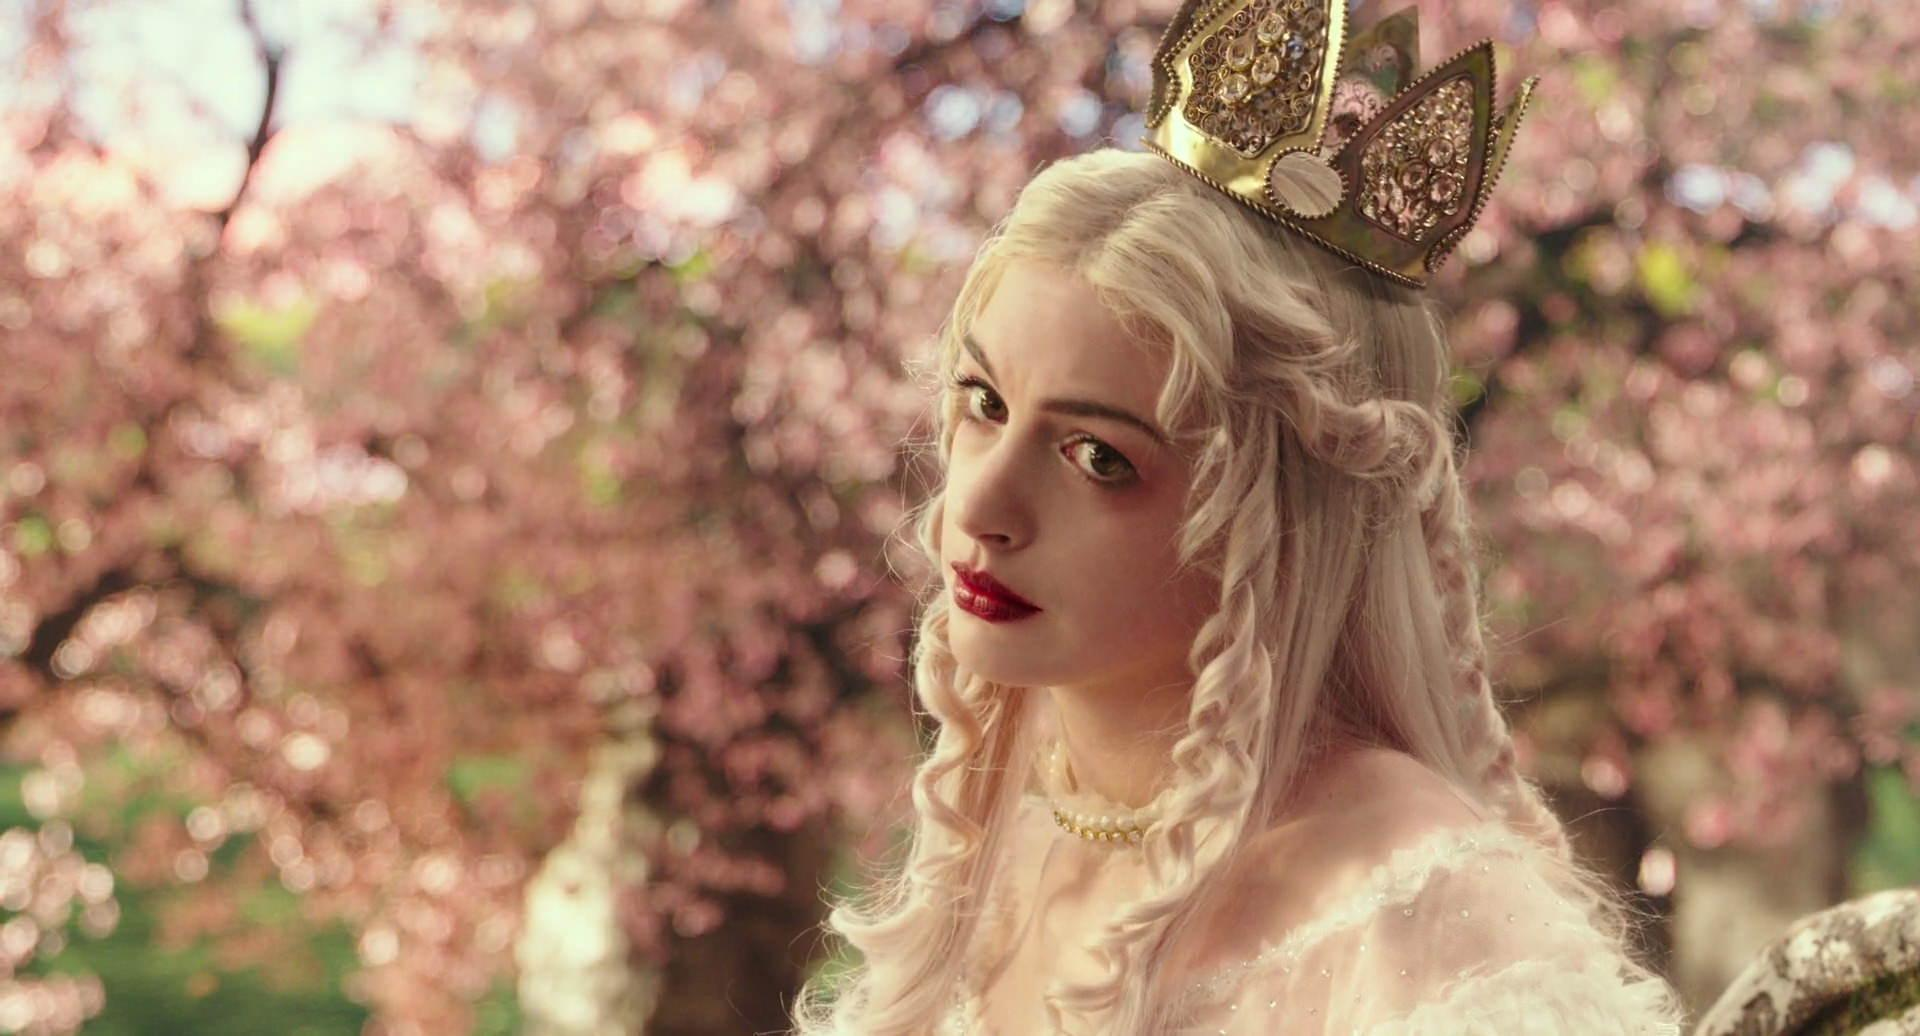 Anne Hathaway curiosità Alice through the looking glass Screencaps